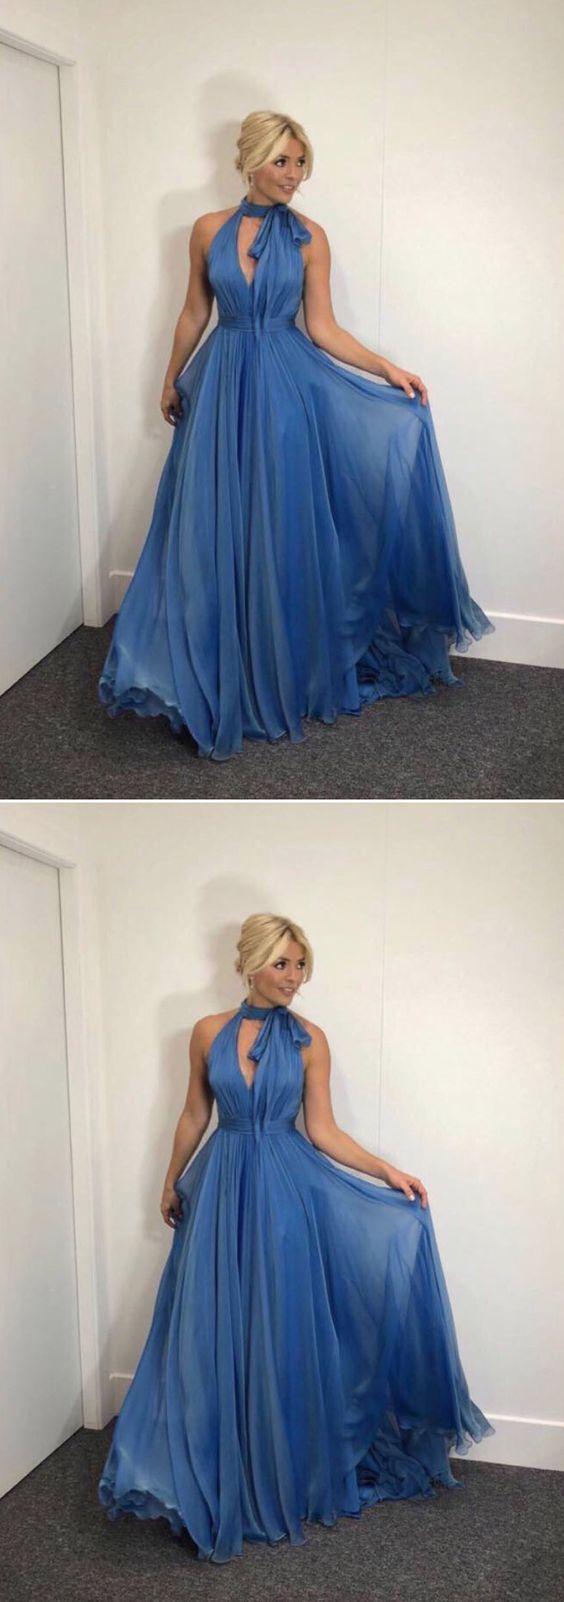 A-Line High Neck Blue Chiffon Long Prom Evening Dress